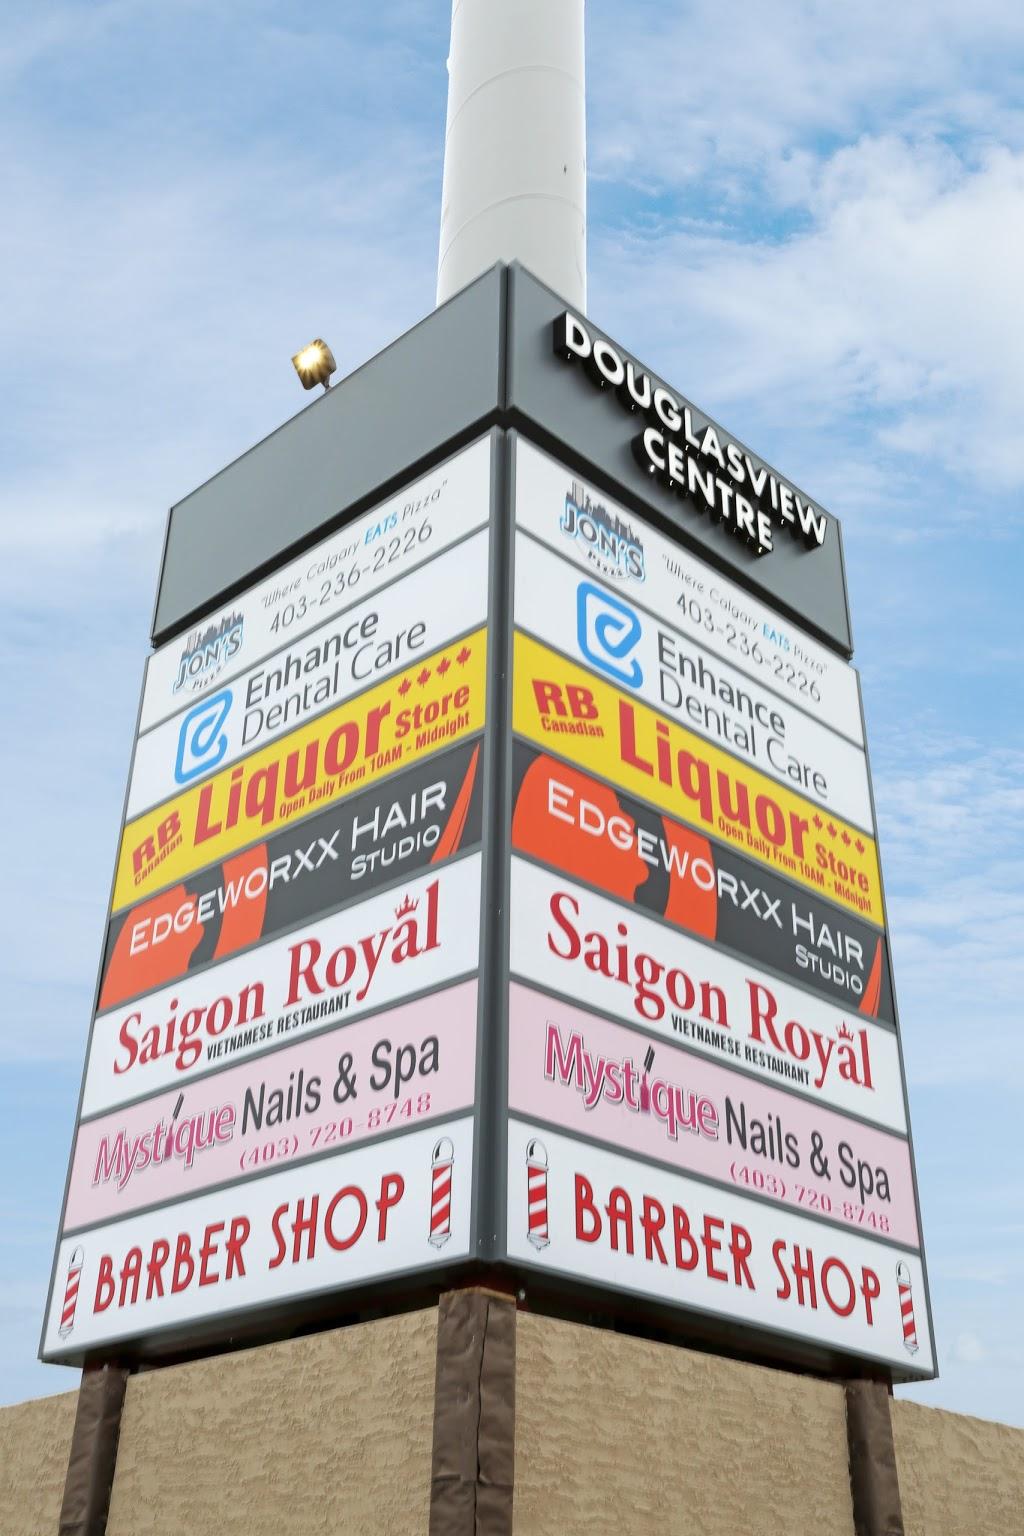 Douglasview Centre | shopping mall | 1L5, 20 Douglas Woods Dr SE, Calgary, AB T2Z 1K2, Canada